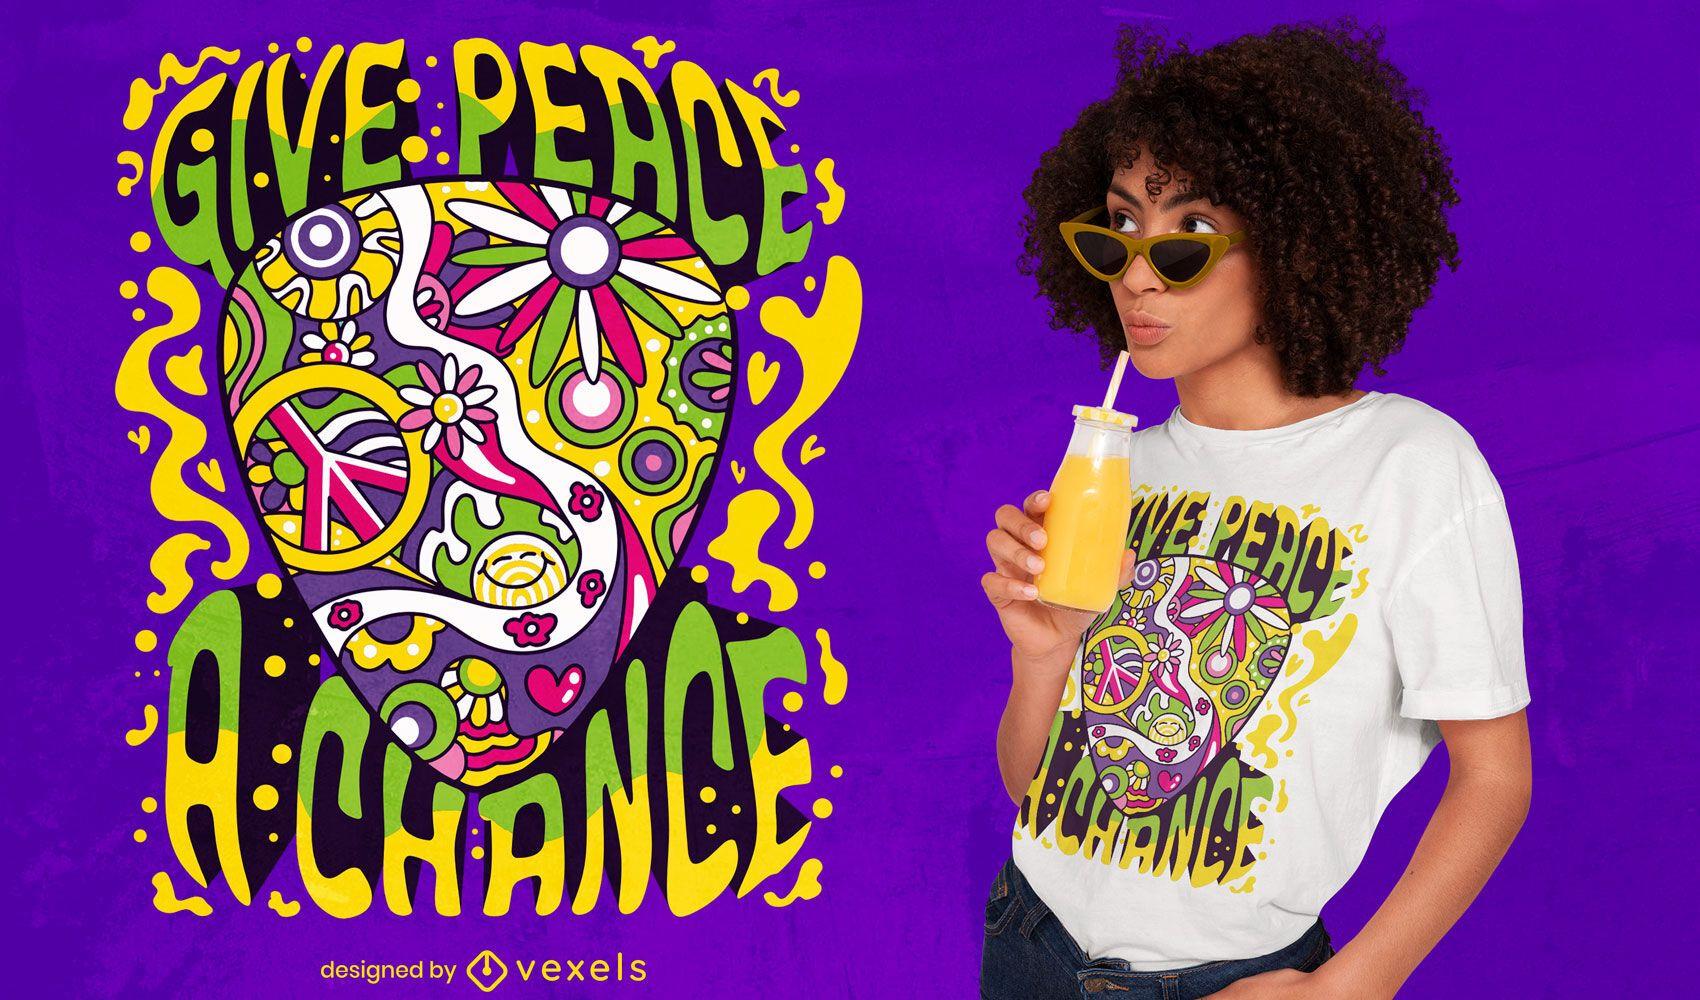 Hippie guitar pick t-shirt design